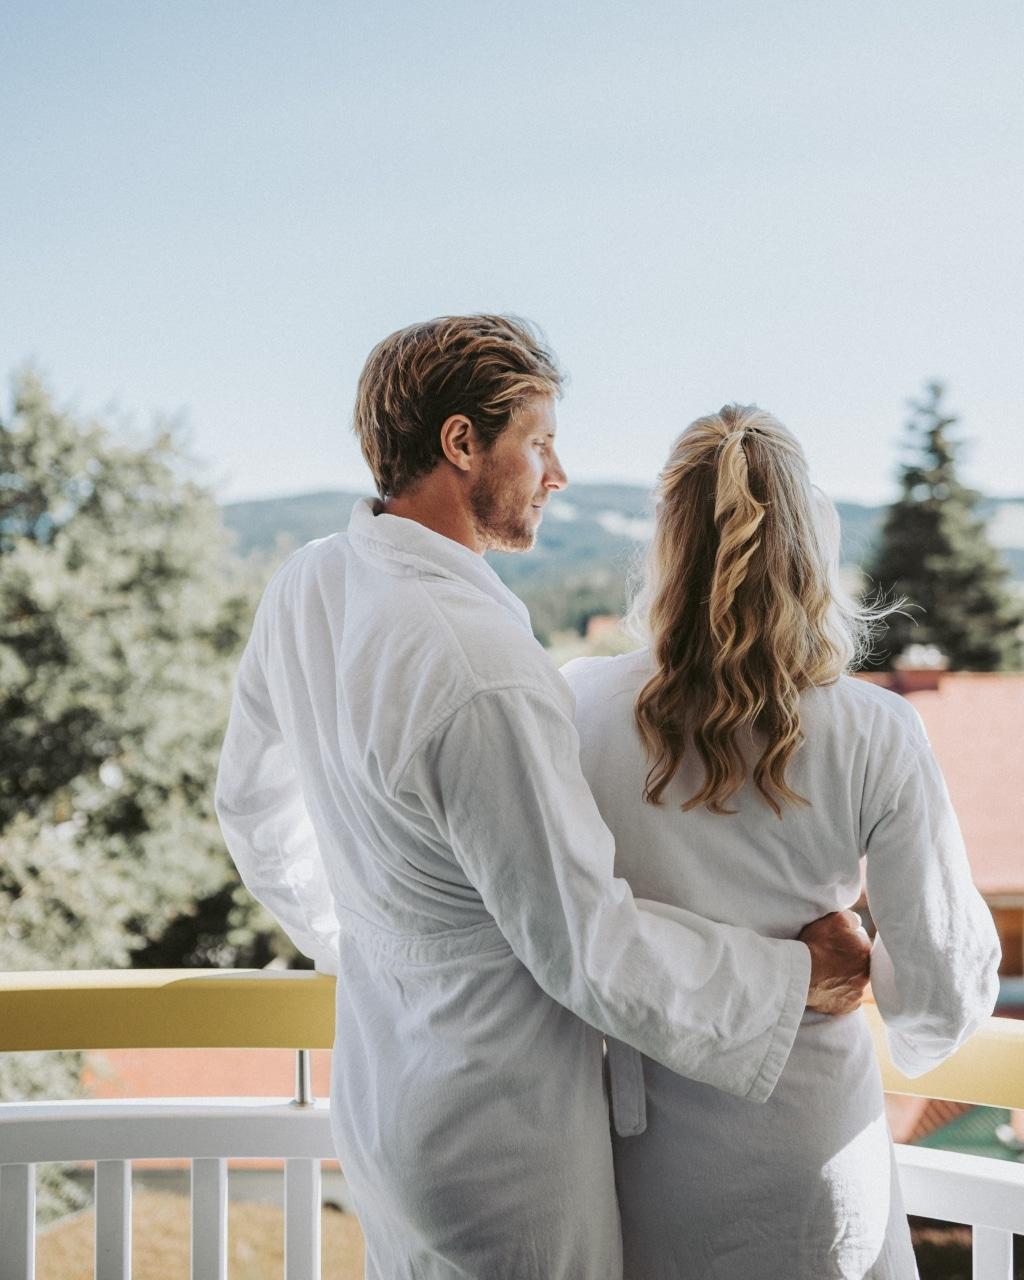 Paar in Bademantel auf Balkon